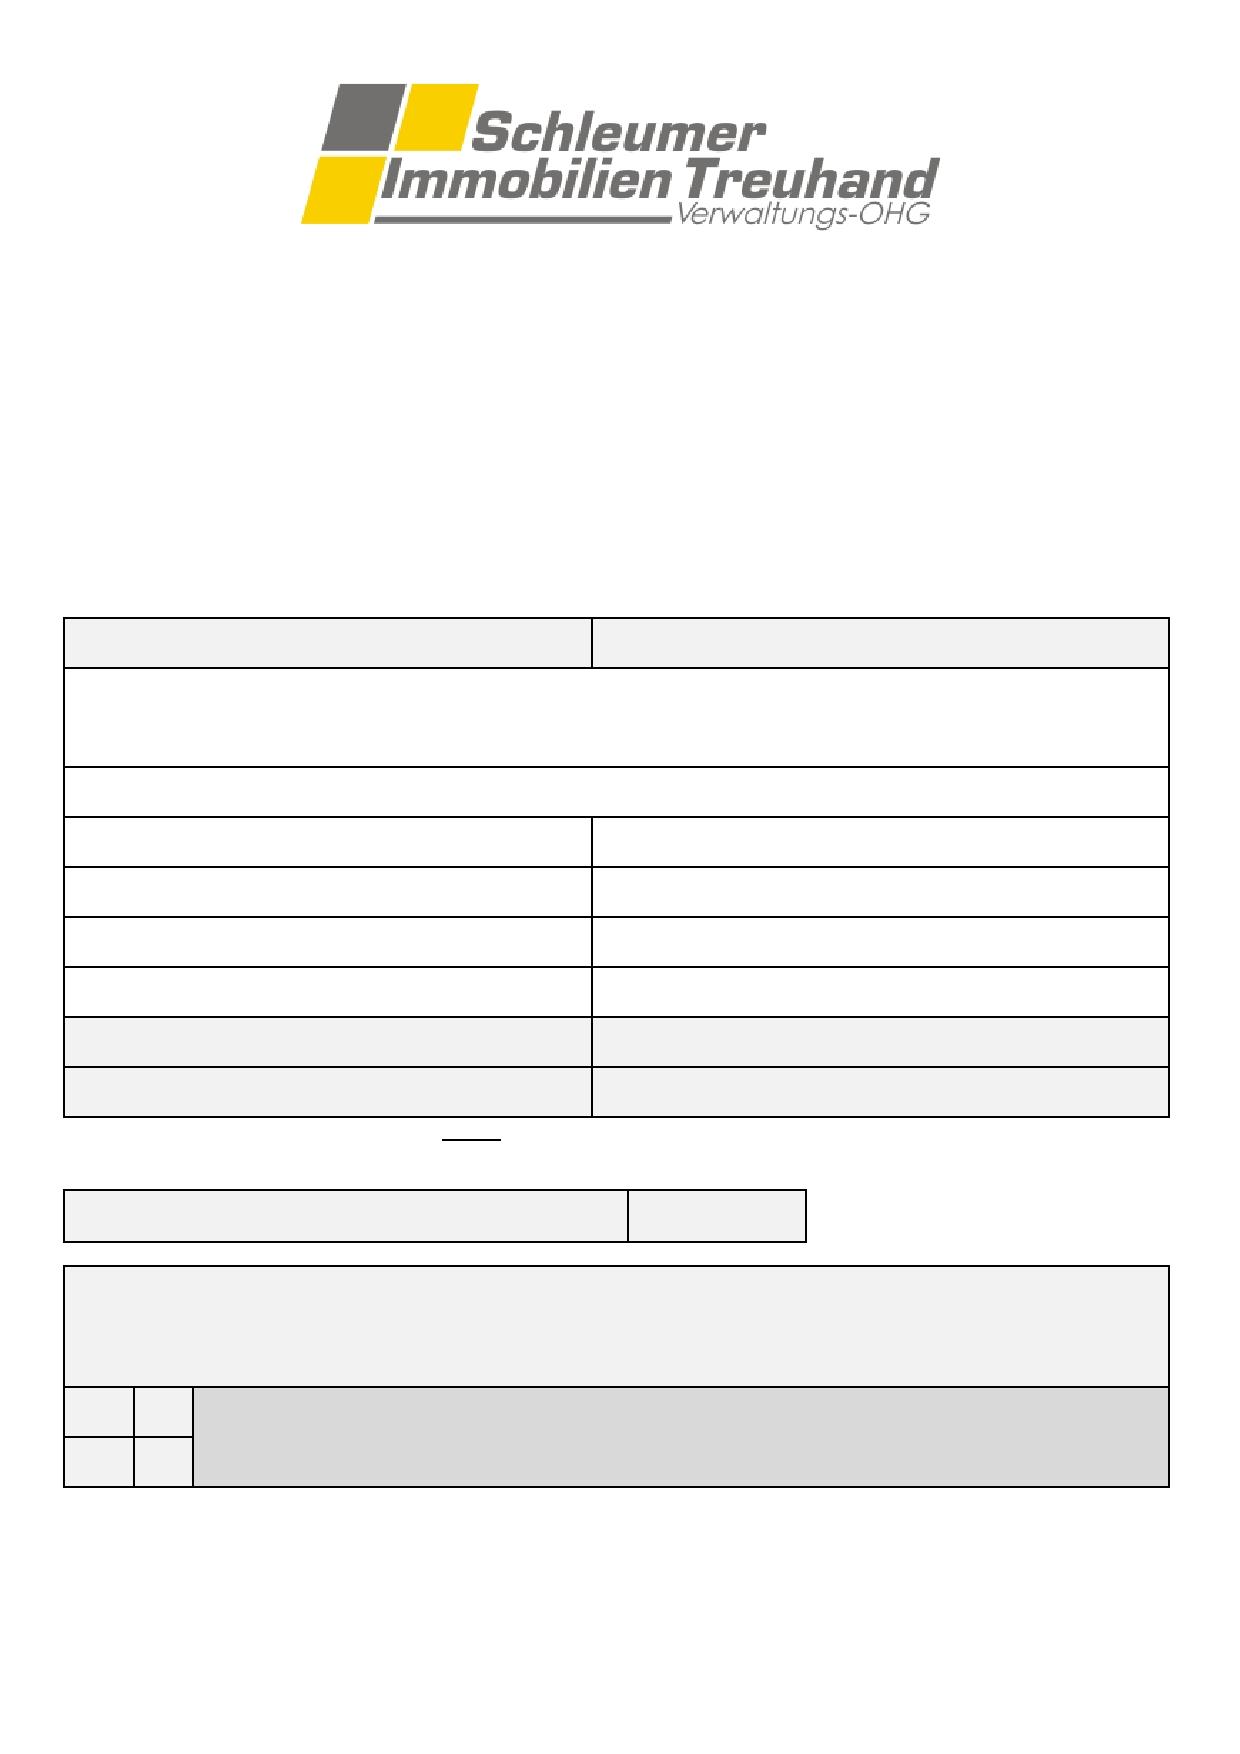 datenblatt mieter hausverwaltung k ln. Black Bedroom Furniture Sets. Home Design Ideas